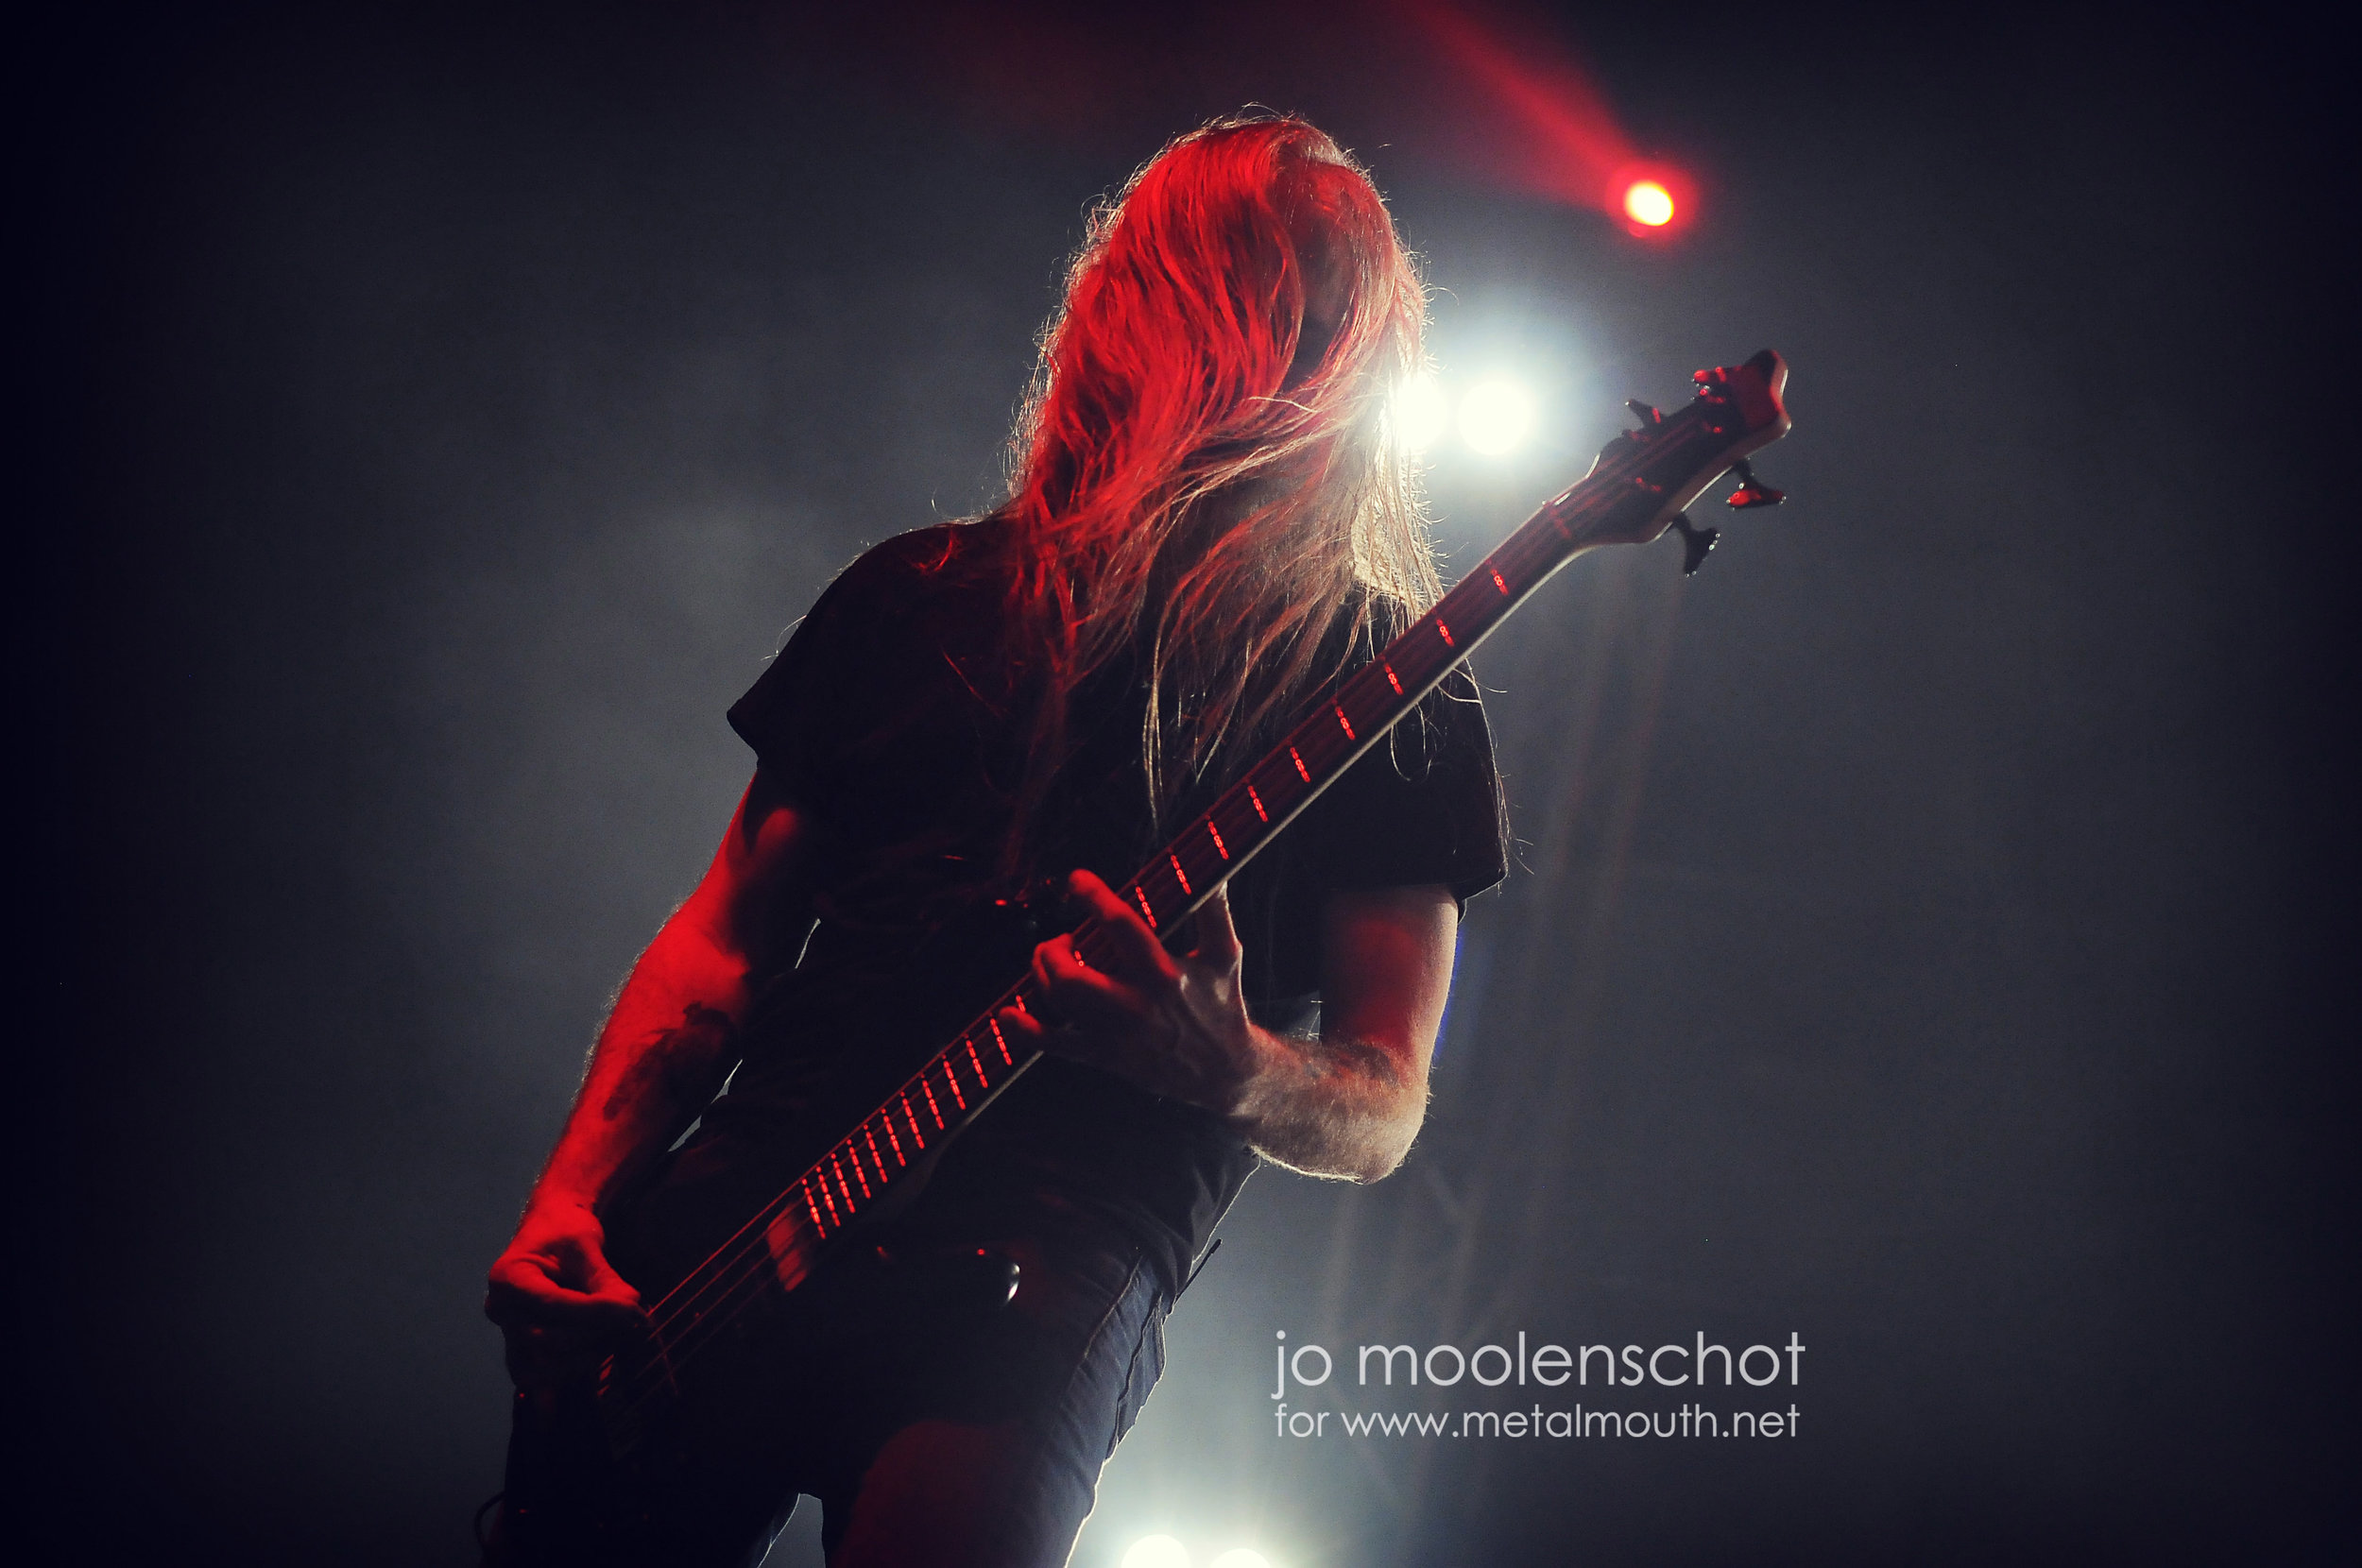 Lamb-Of-God-Jo-Brixton-Moolenschot-music-photographer-london05.jpg